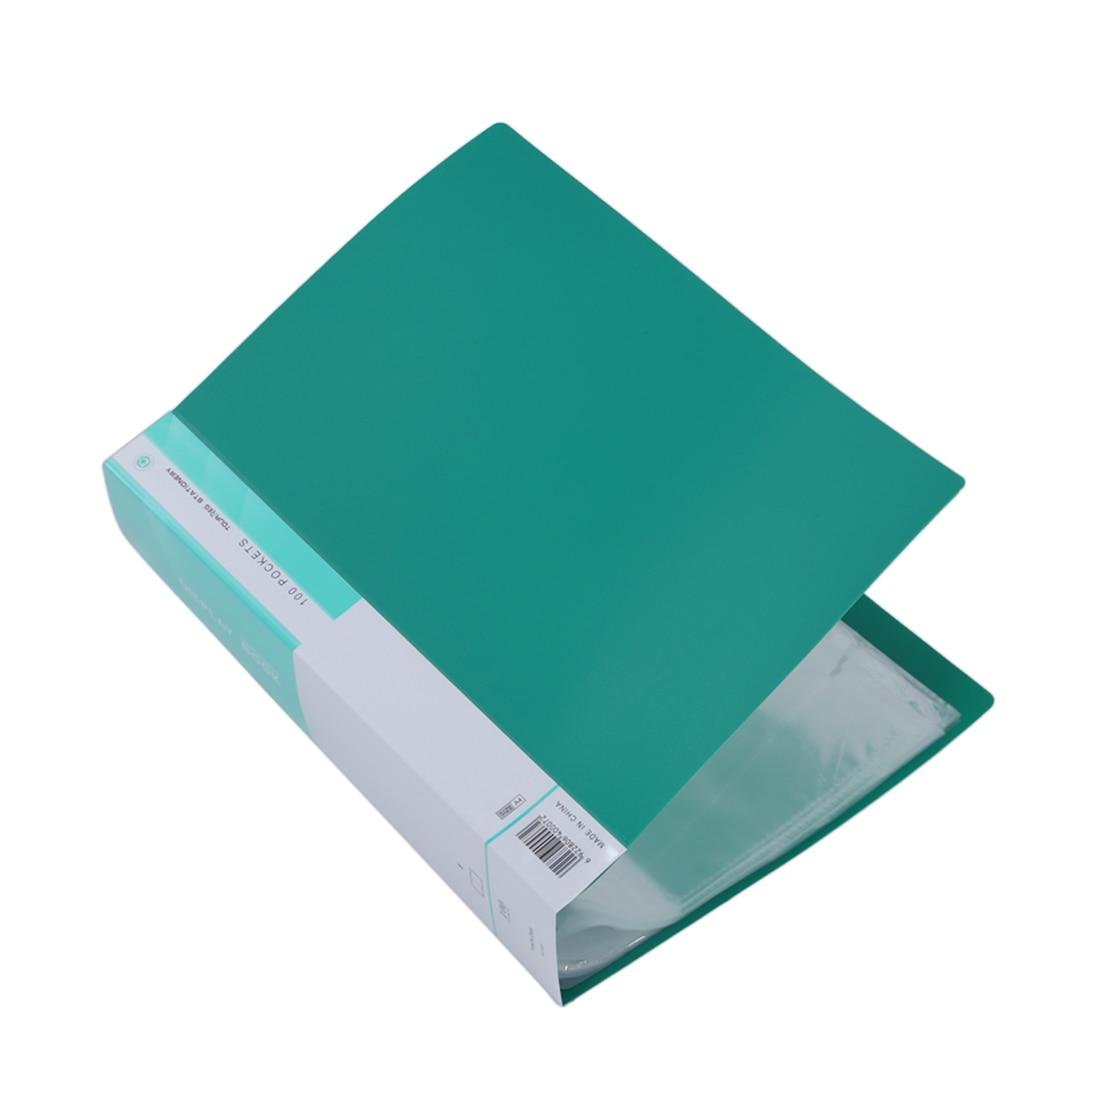 все цены на A4 Display Book Presentation Documents Storage Portfolio Folder 100 Pockets онлайн